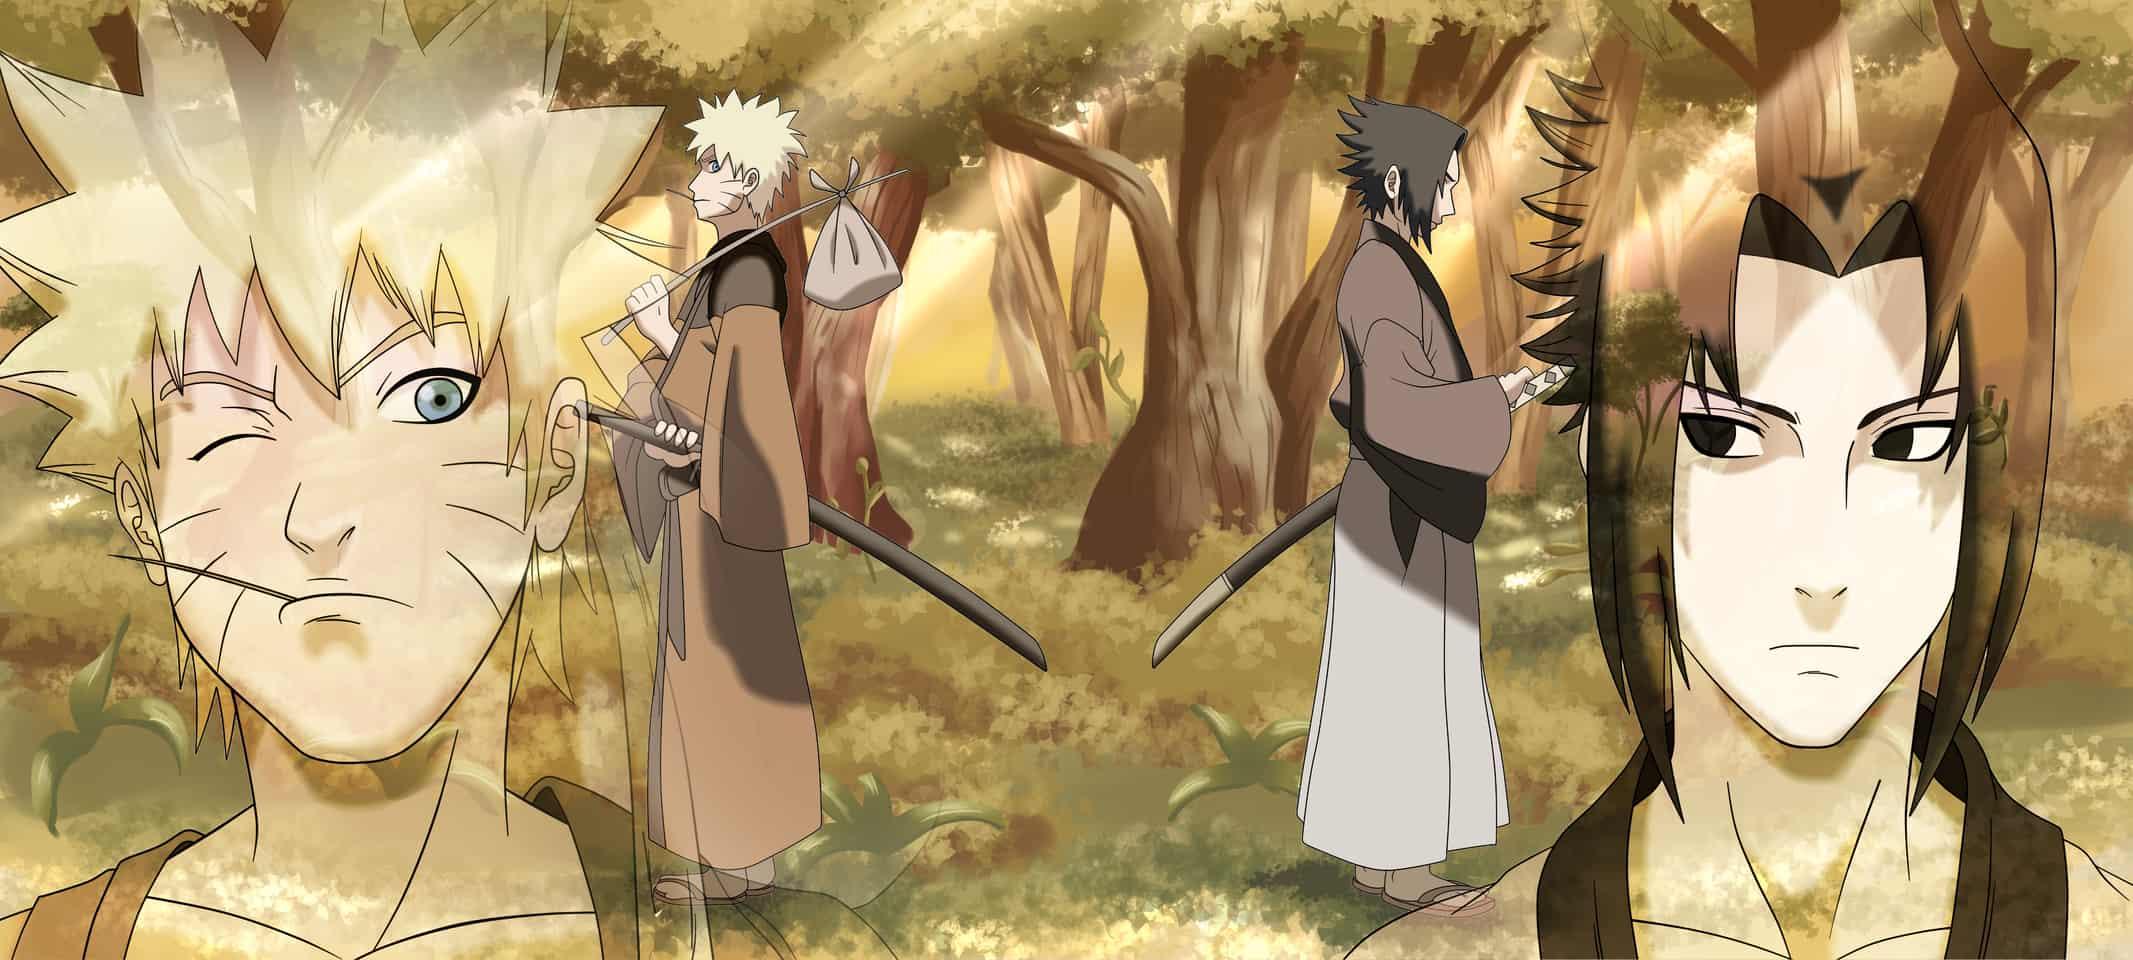 Naruto vs Sasuke ED 6 Version